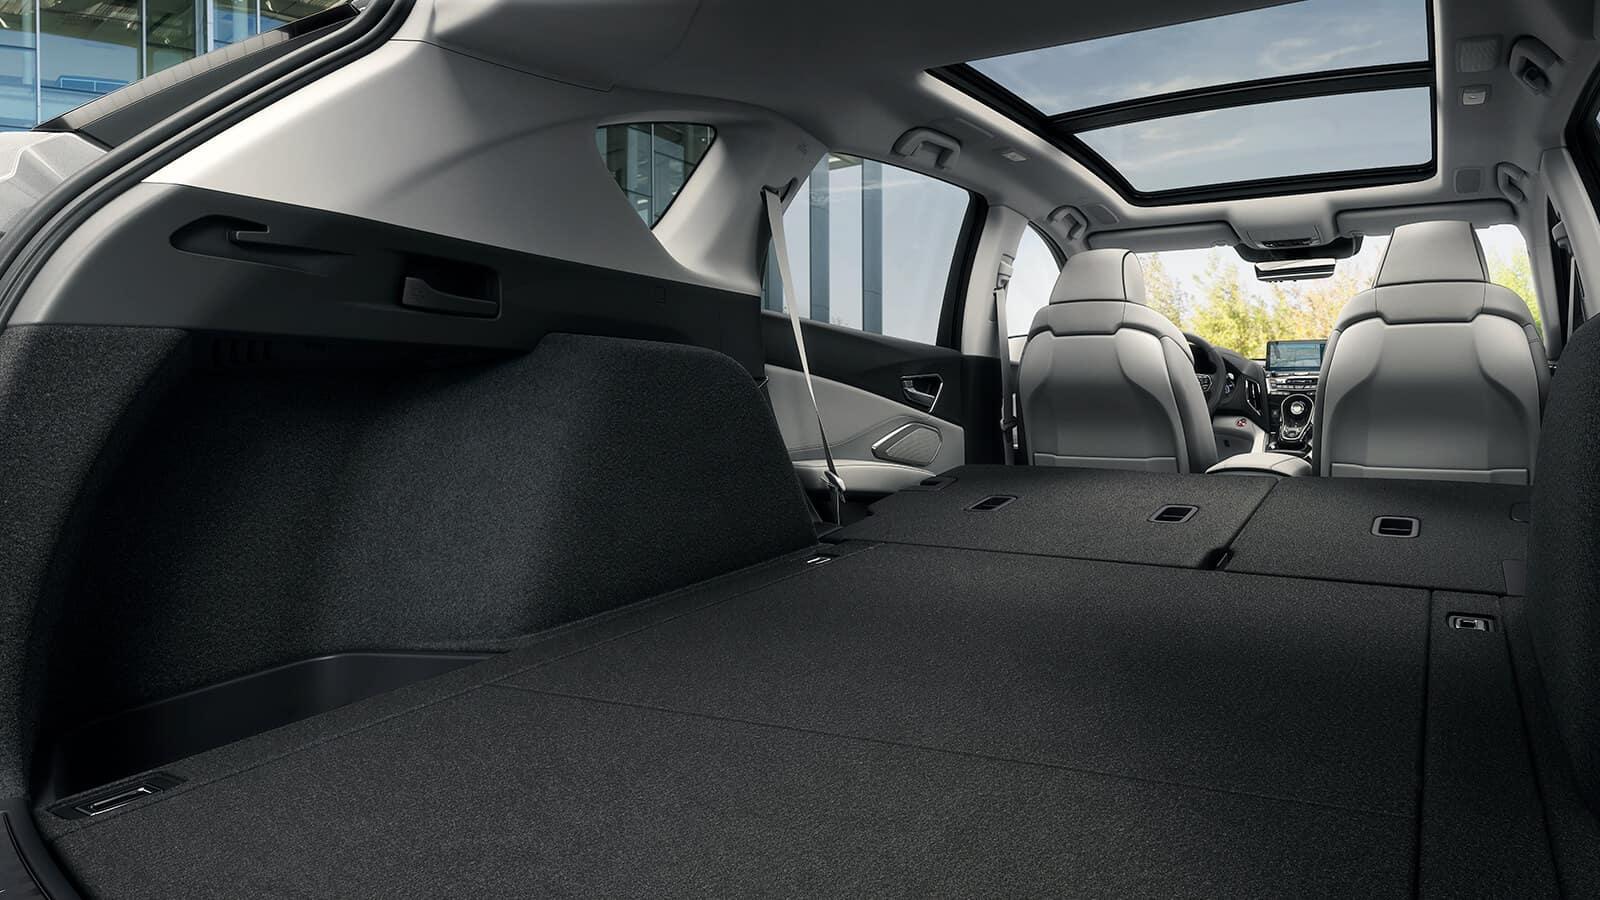 2020 Acura RDX Interior Flat Cargo Area